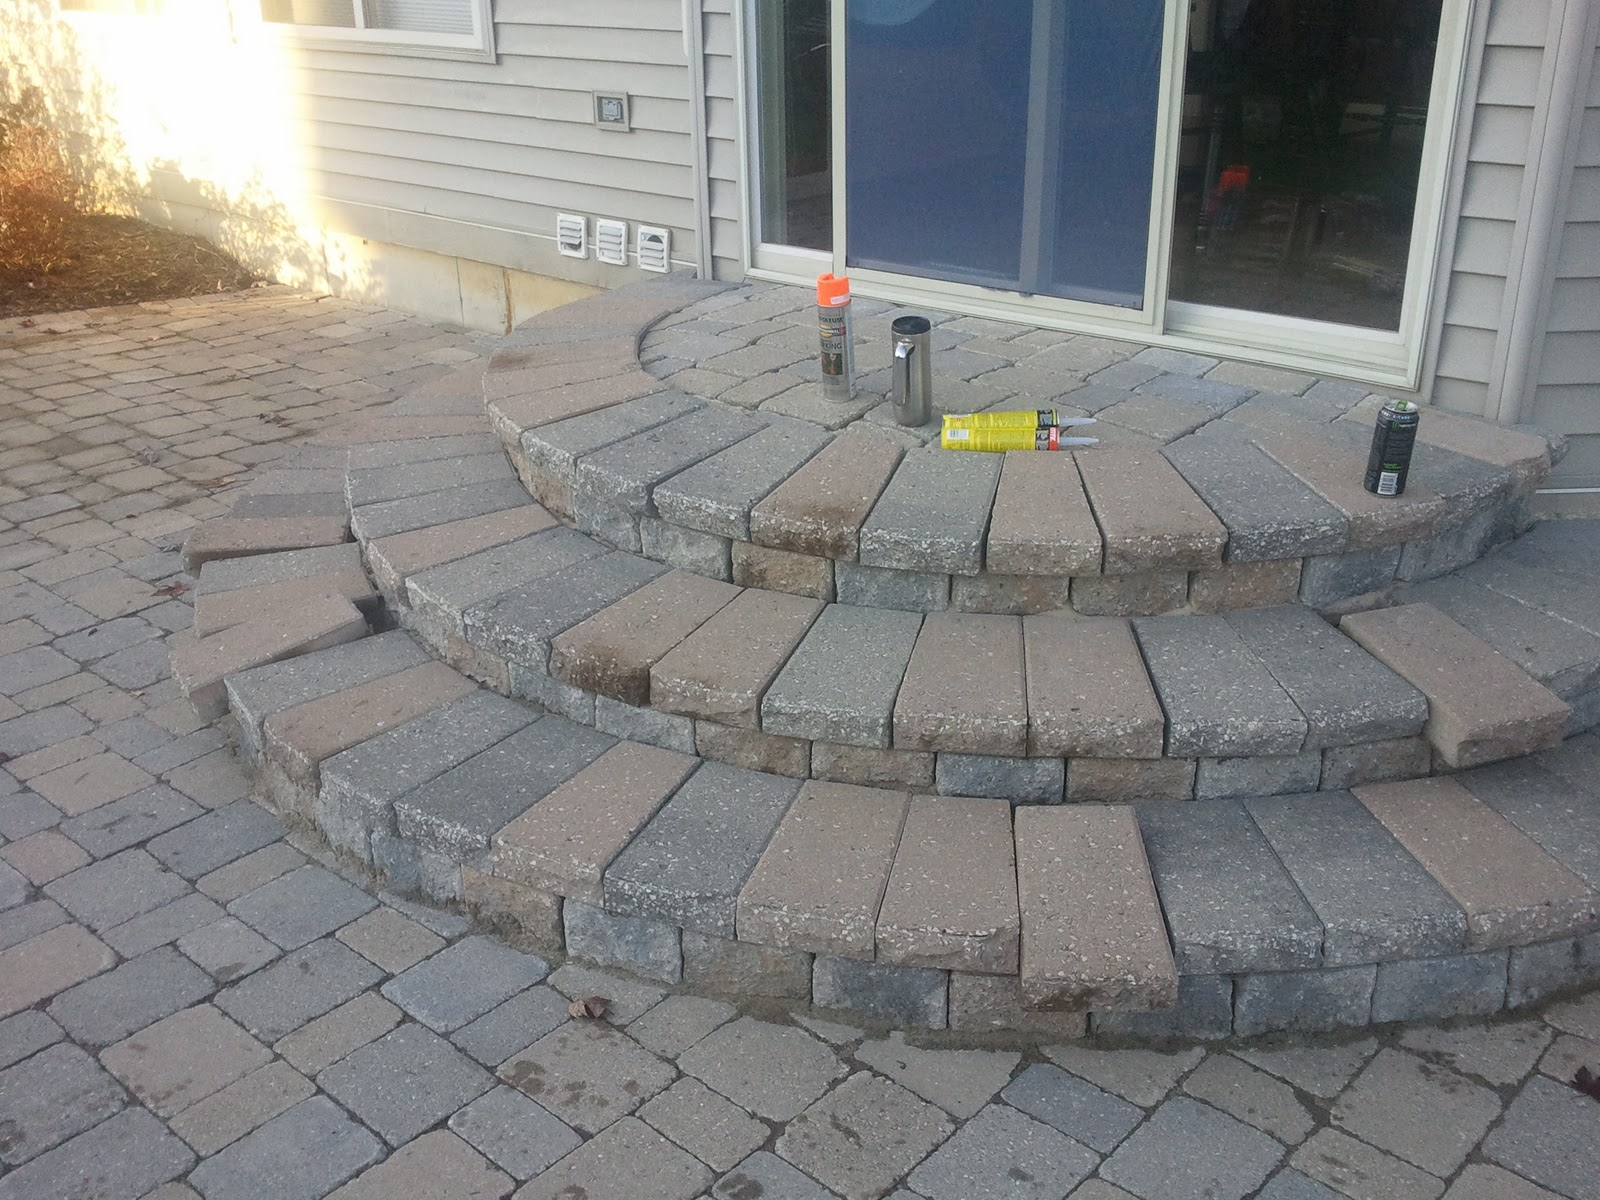 Patio Blocks And Stones : Brick pavers canton plymouth northville ann arbor patio